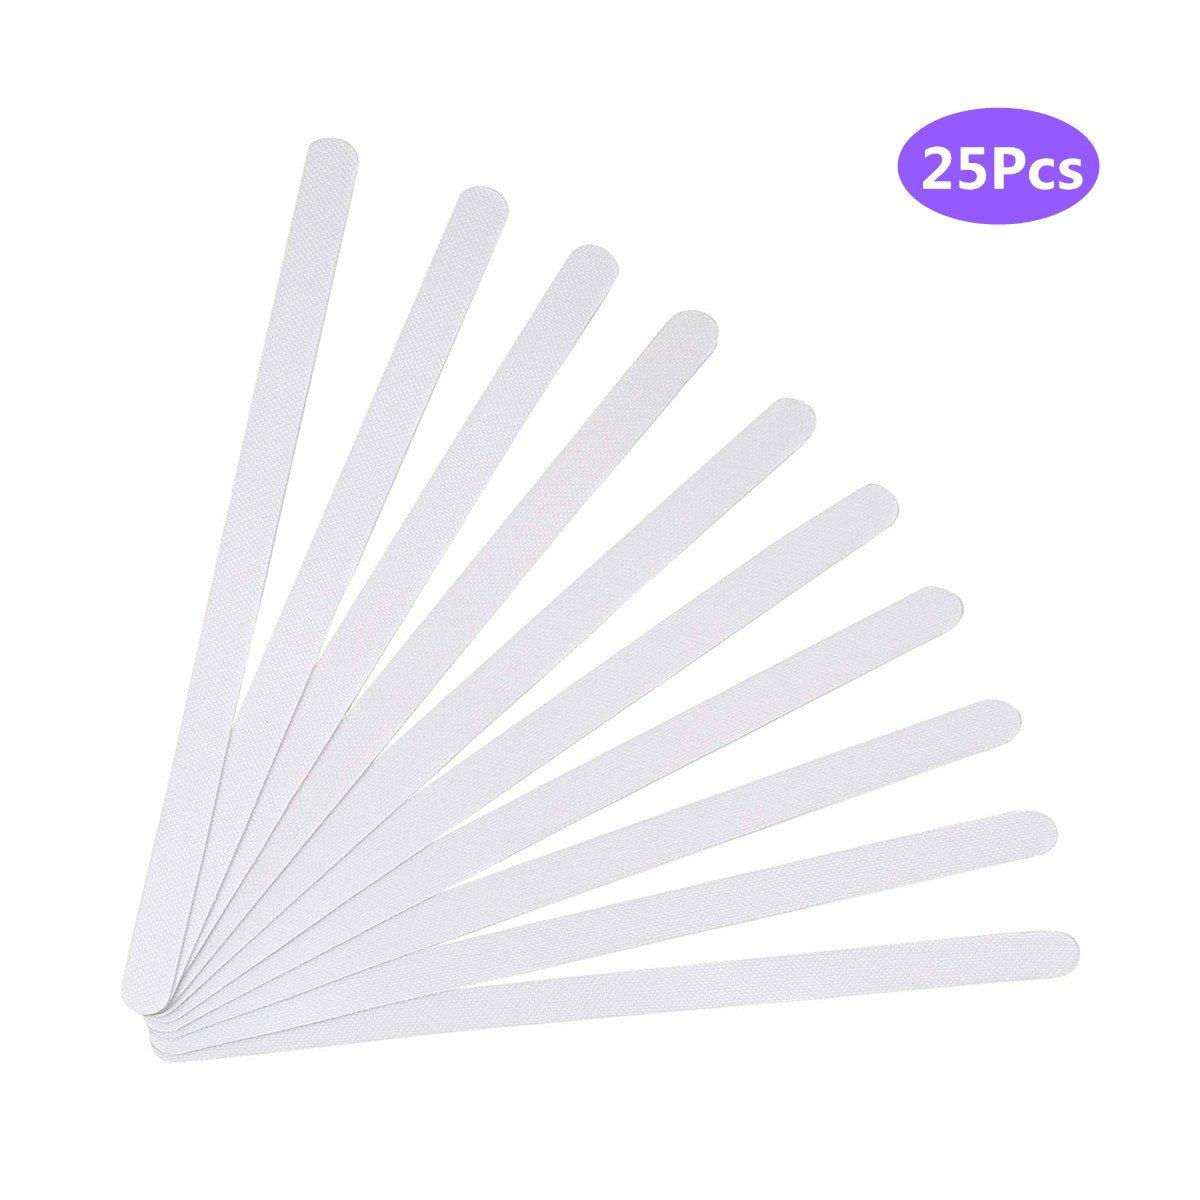 Fayre Fairy Anti Slip Strip Stickers, 25pcs Non Slip Shower Strips Pad Flooring Safety Tape Mat for Bath Shower - White